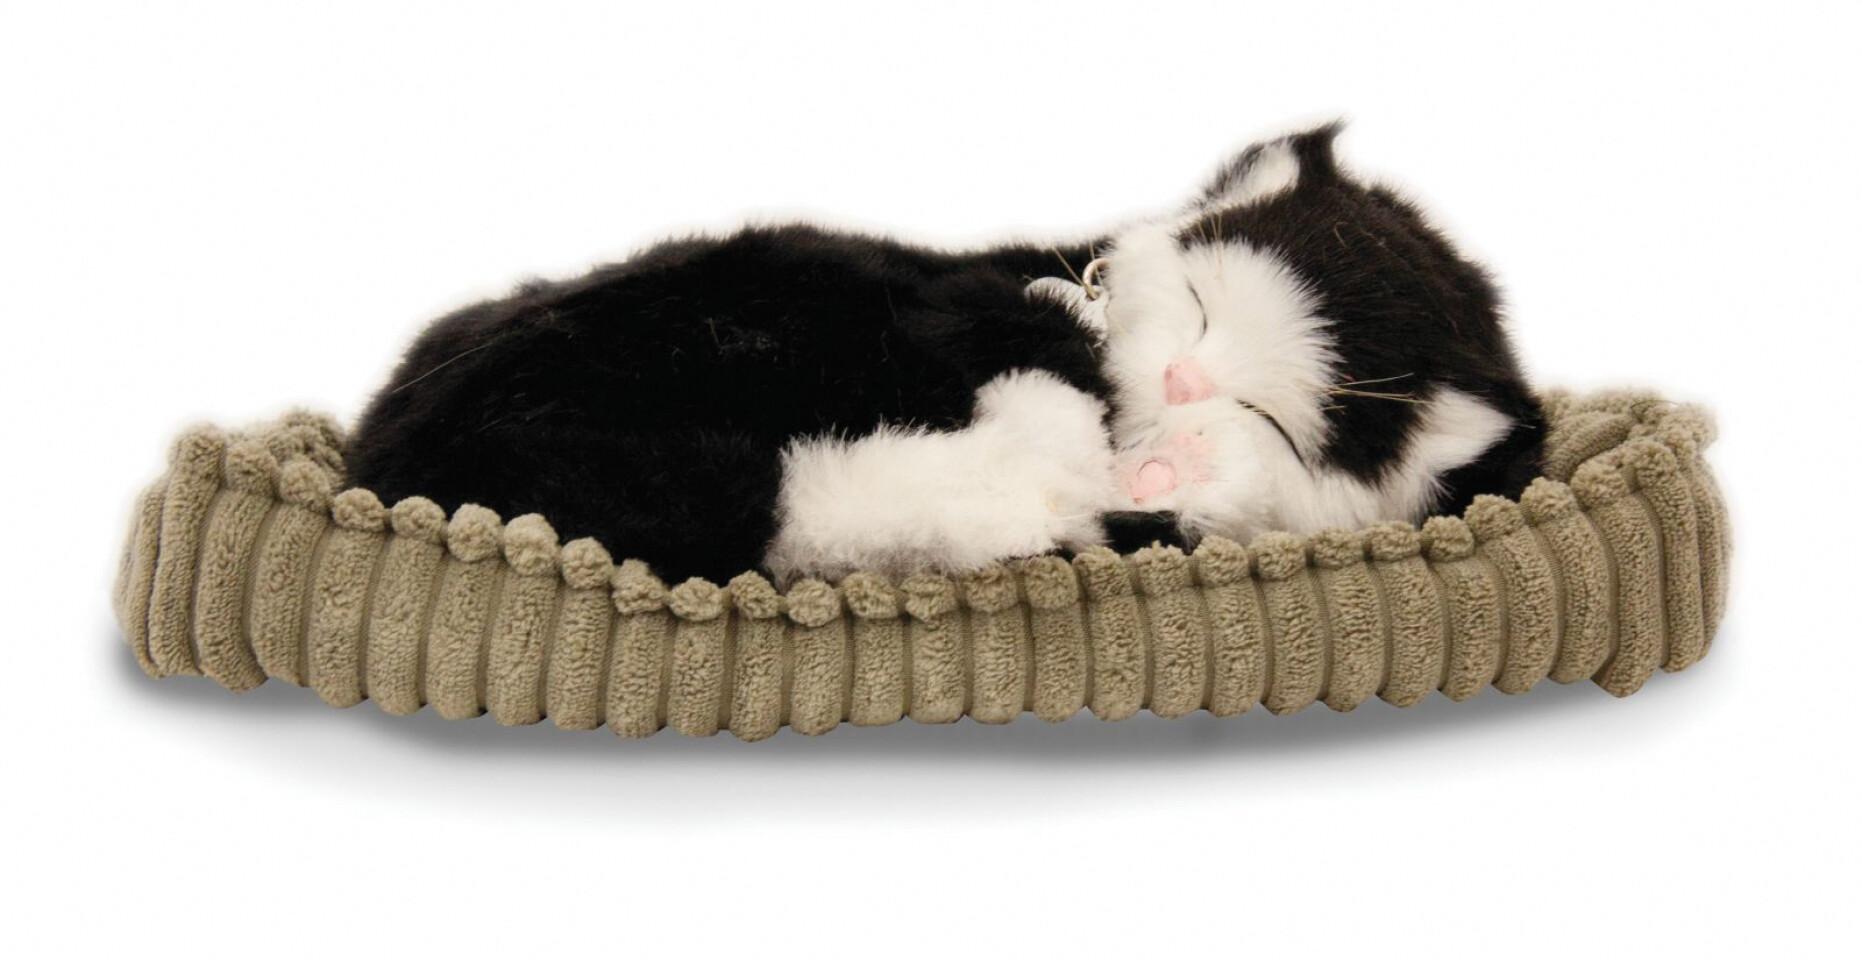 Sovande katt - svart/vit